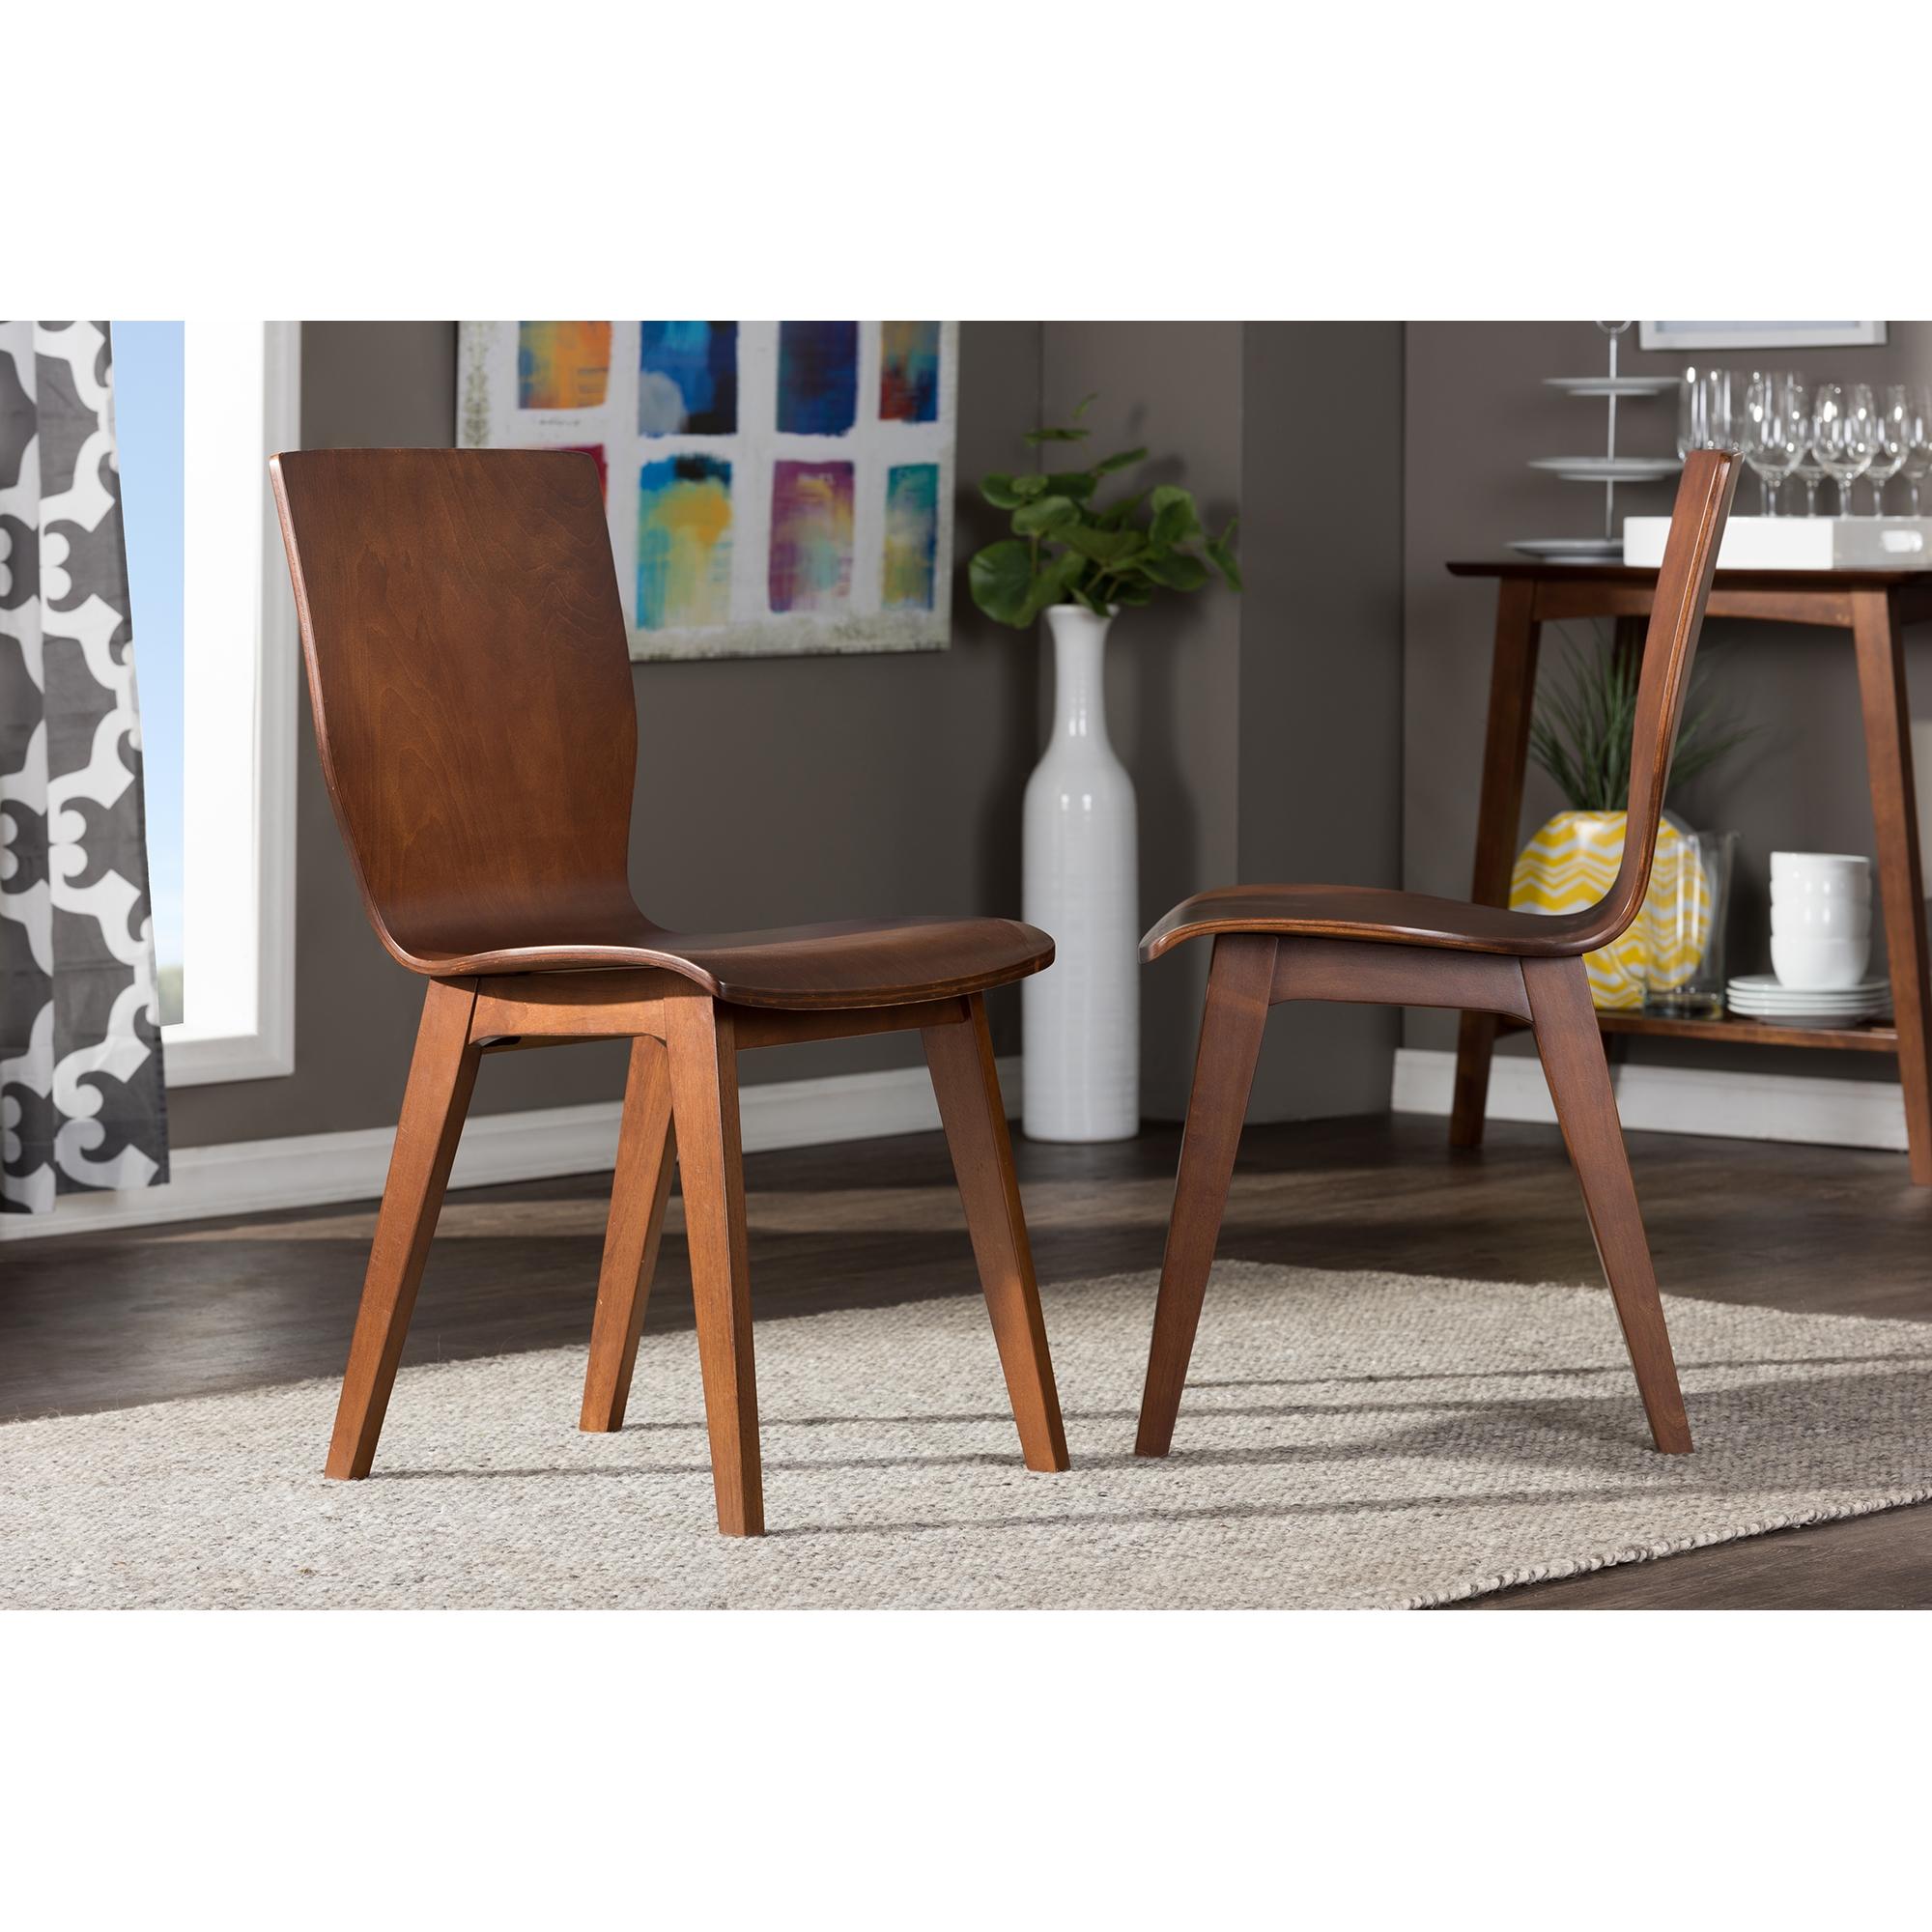 baxton studio elsa midcentury modern style dark walnut bent wood dining chair